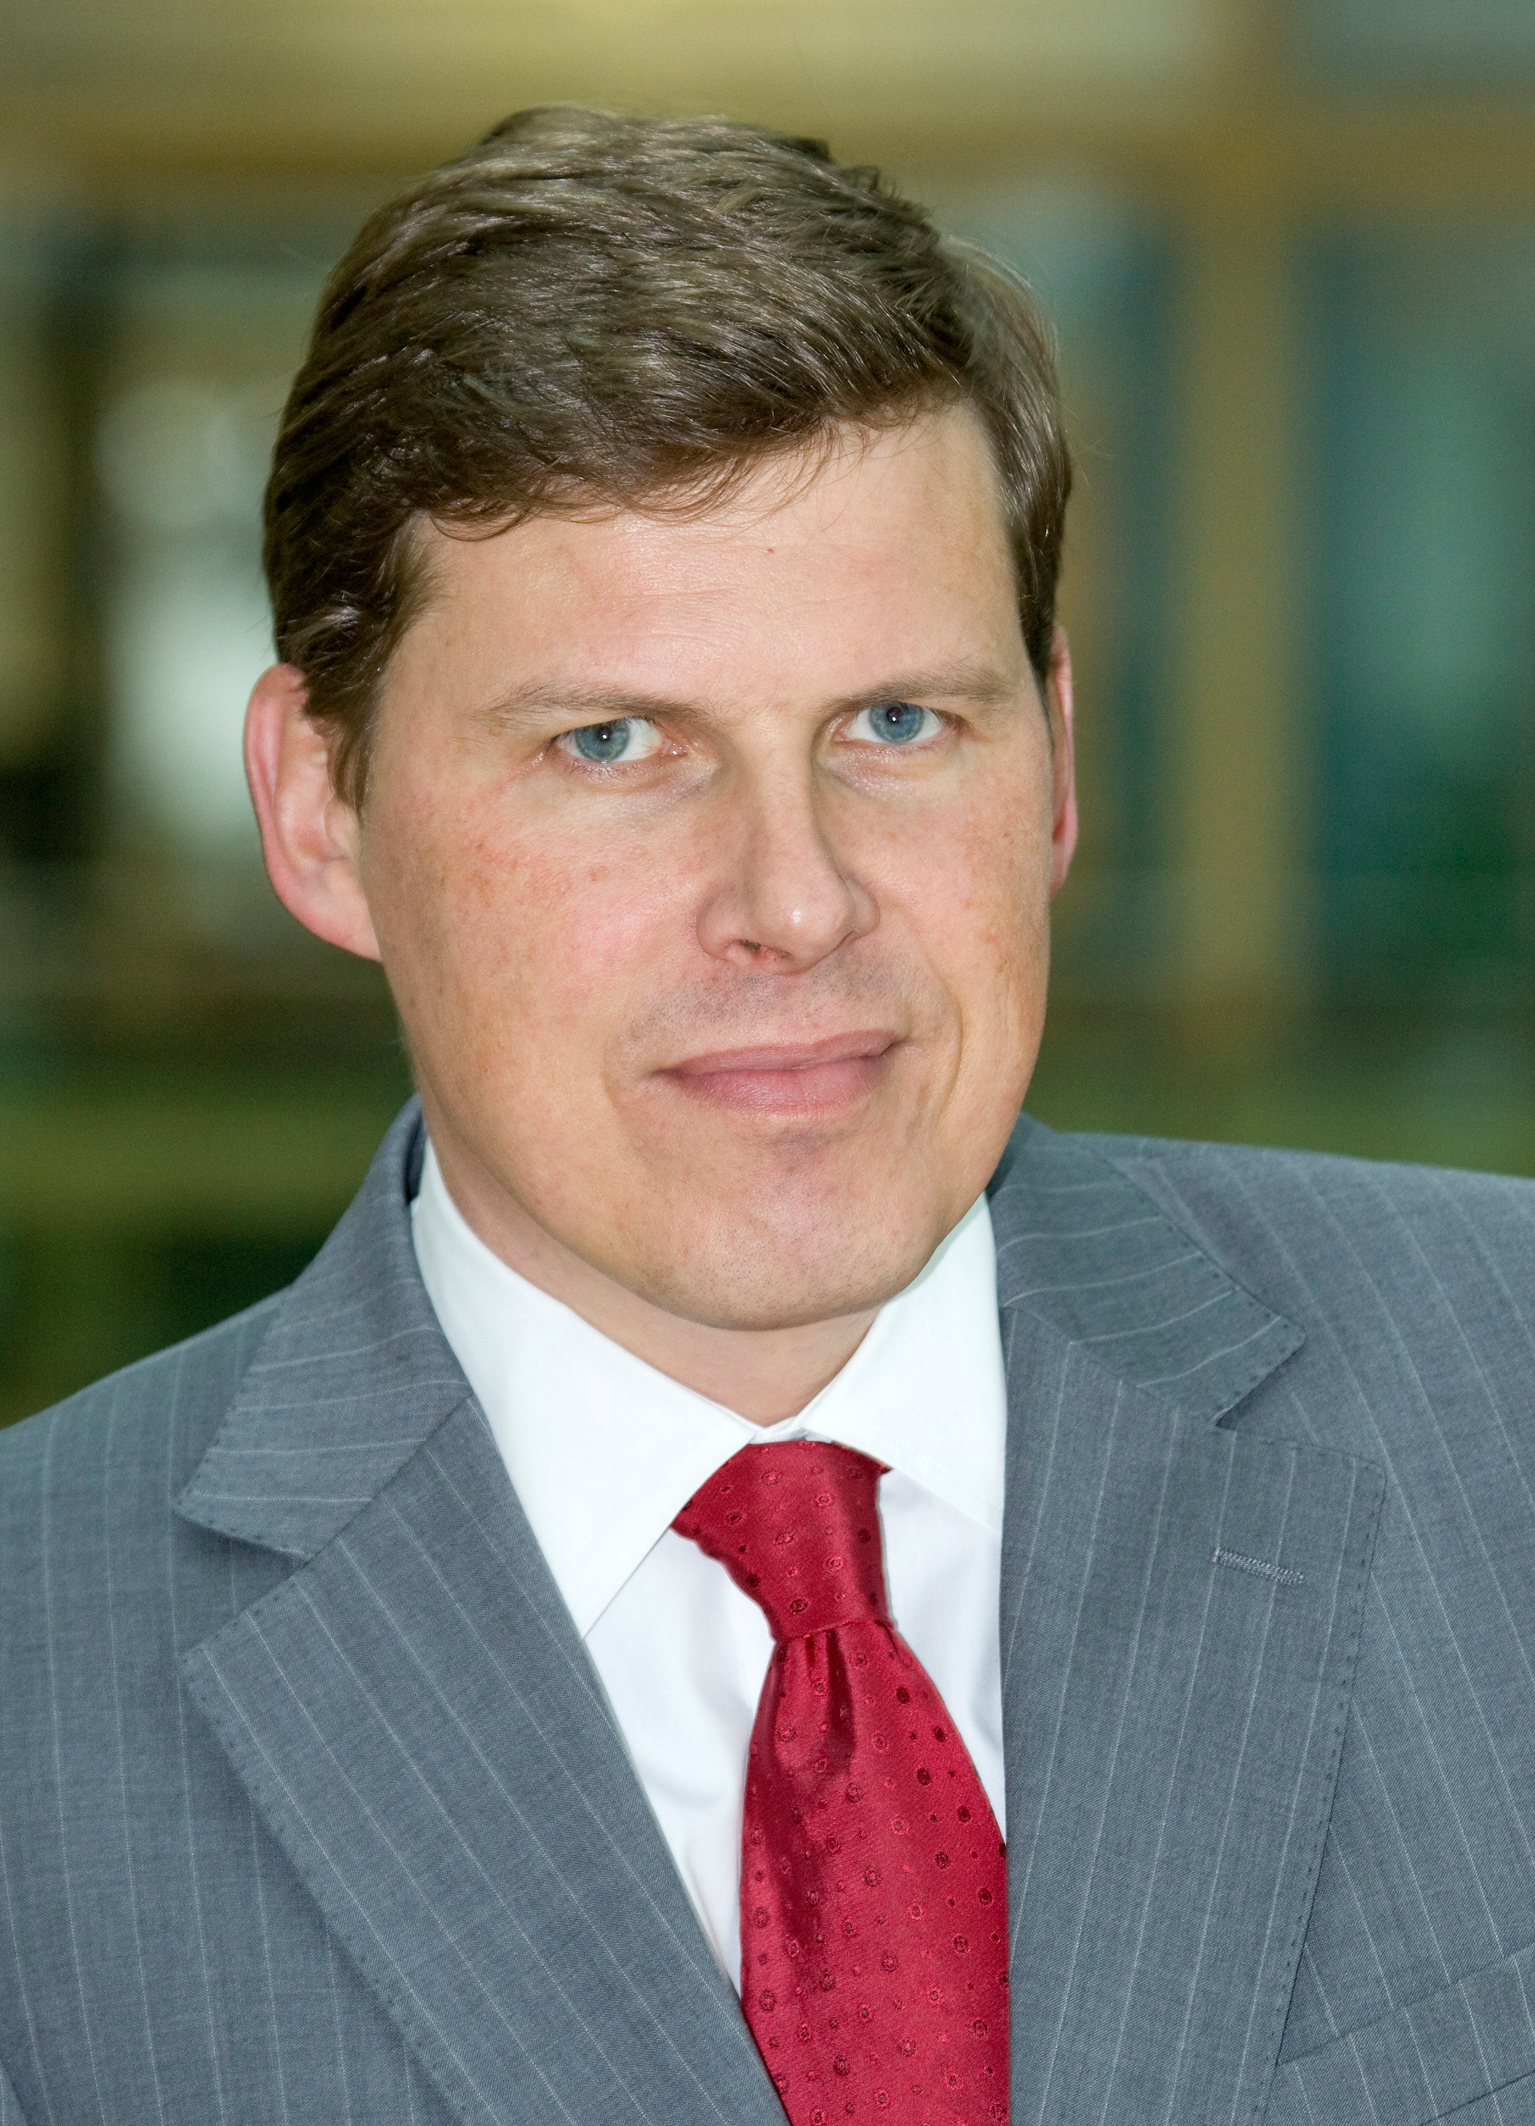 Professor Klaus Dugi, Corporate Senior Vice President Medicine, Boehringer Ingelheim (Photo: Business Wire)